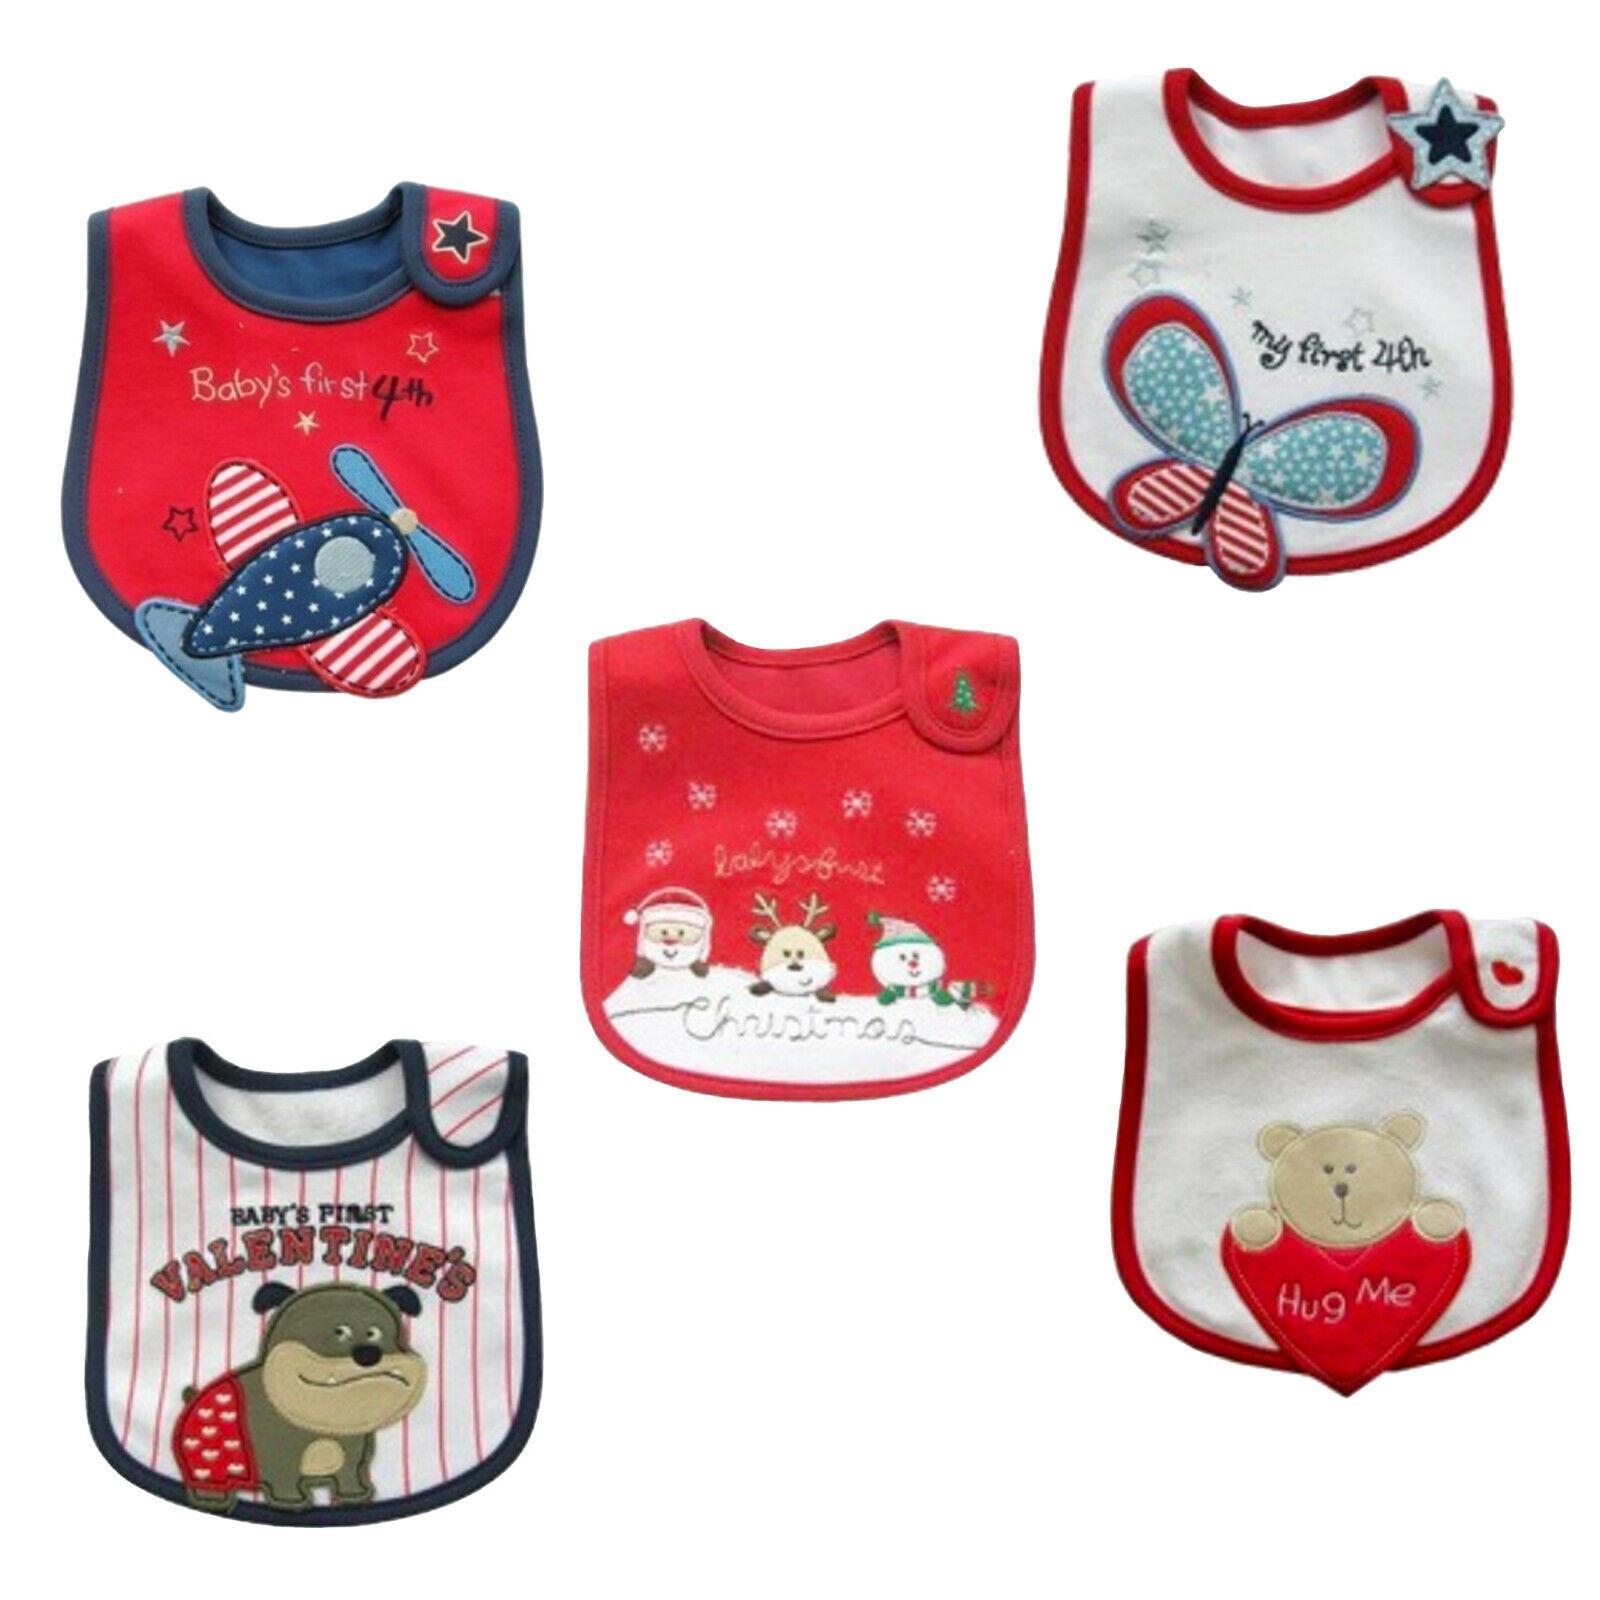 Baby Waterproof Bibs w Holiday Designs - 4th, Christmas, Val